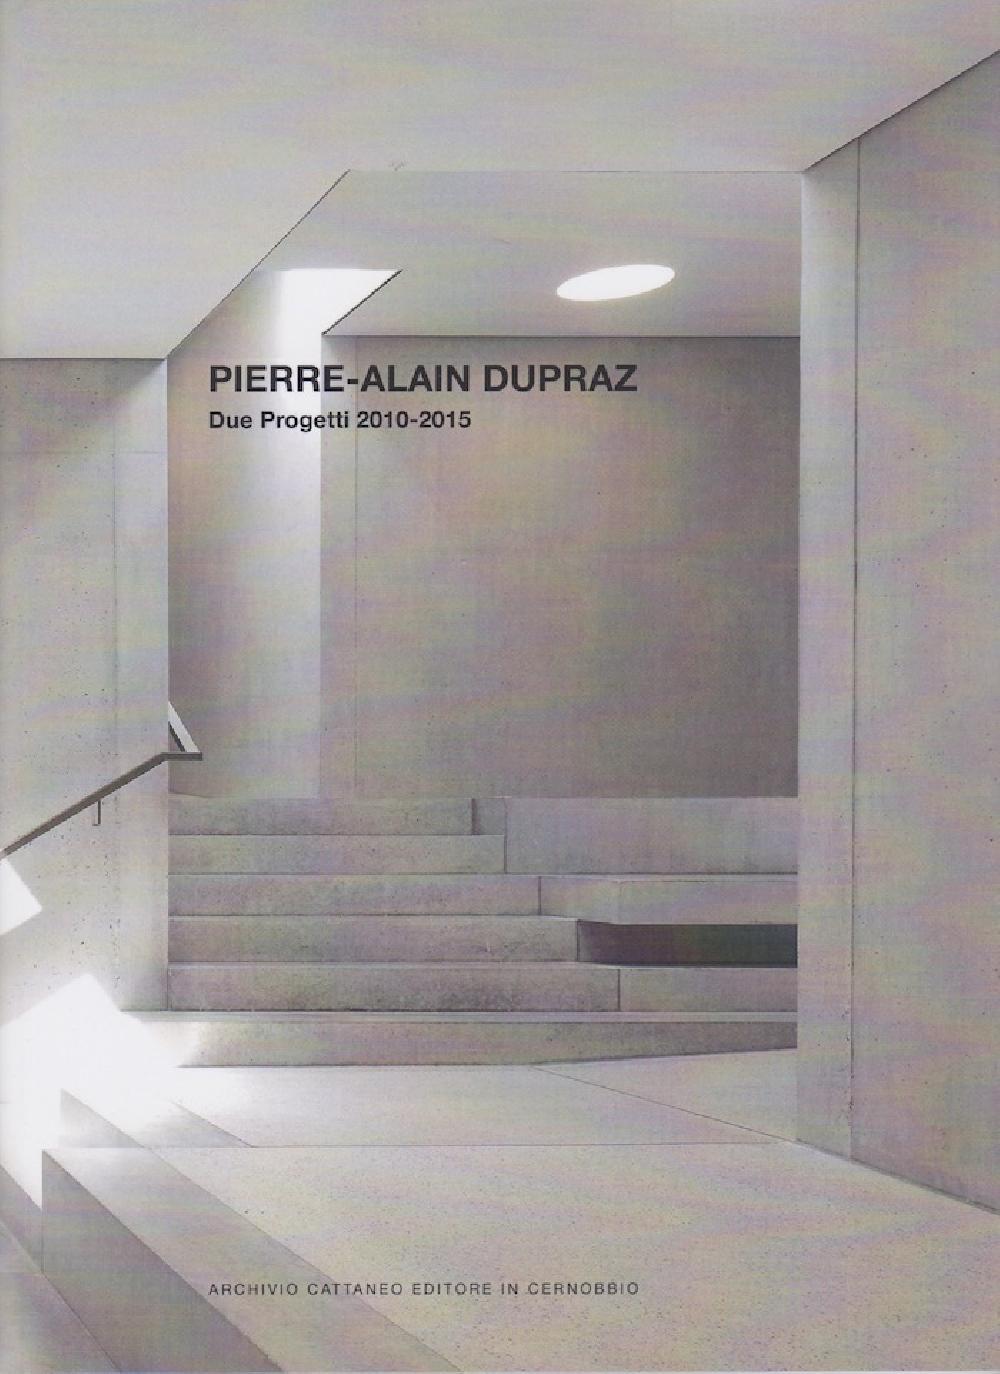 Pierre-Alain Dupraz Due Progetti 2010-2015